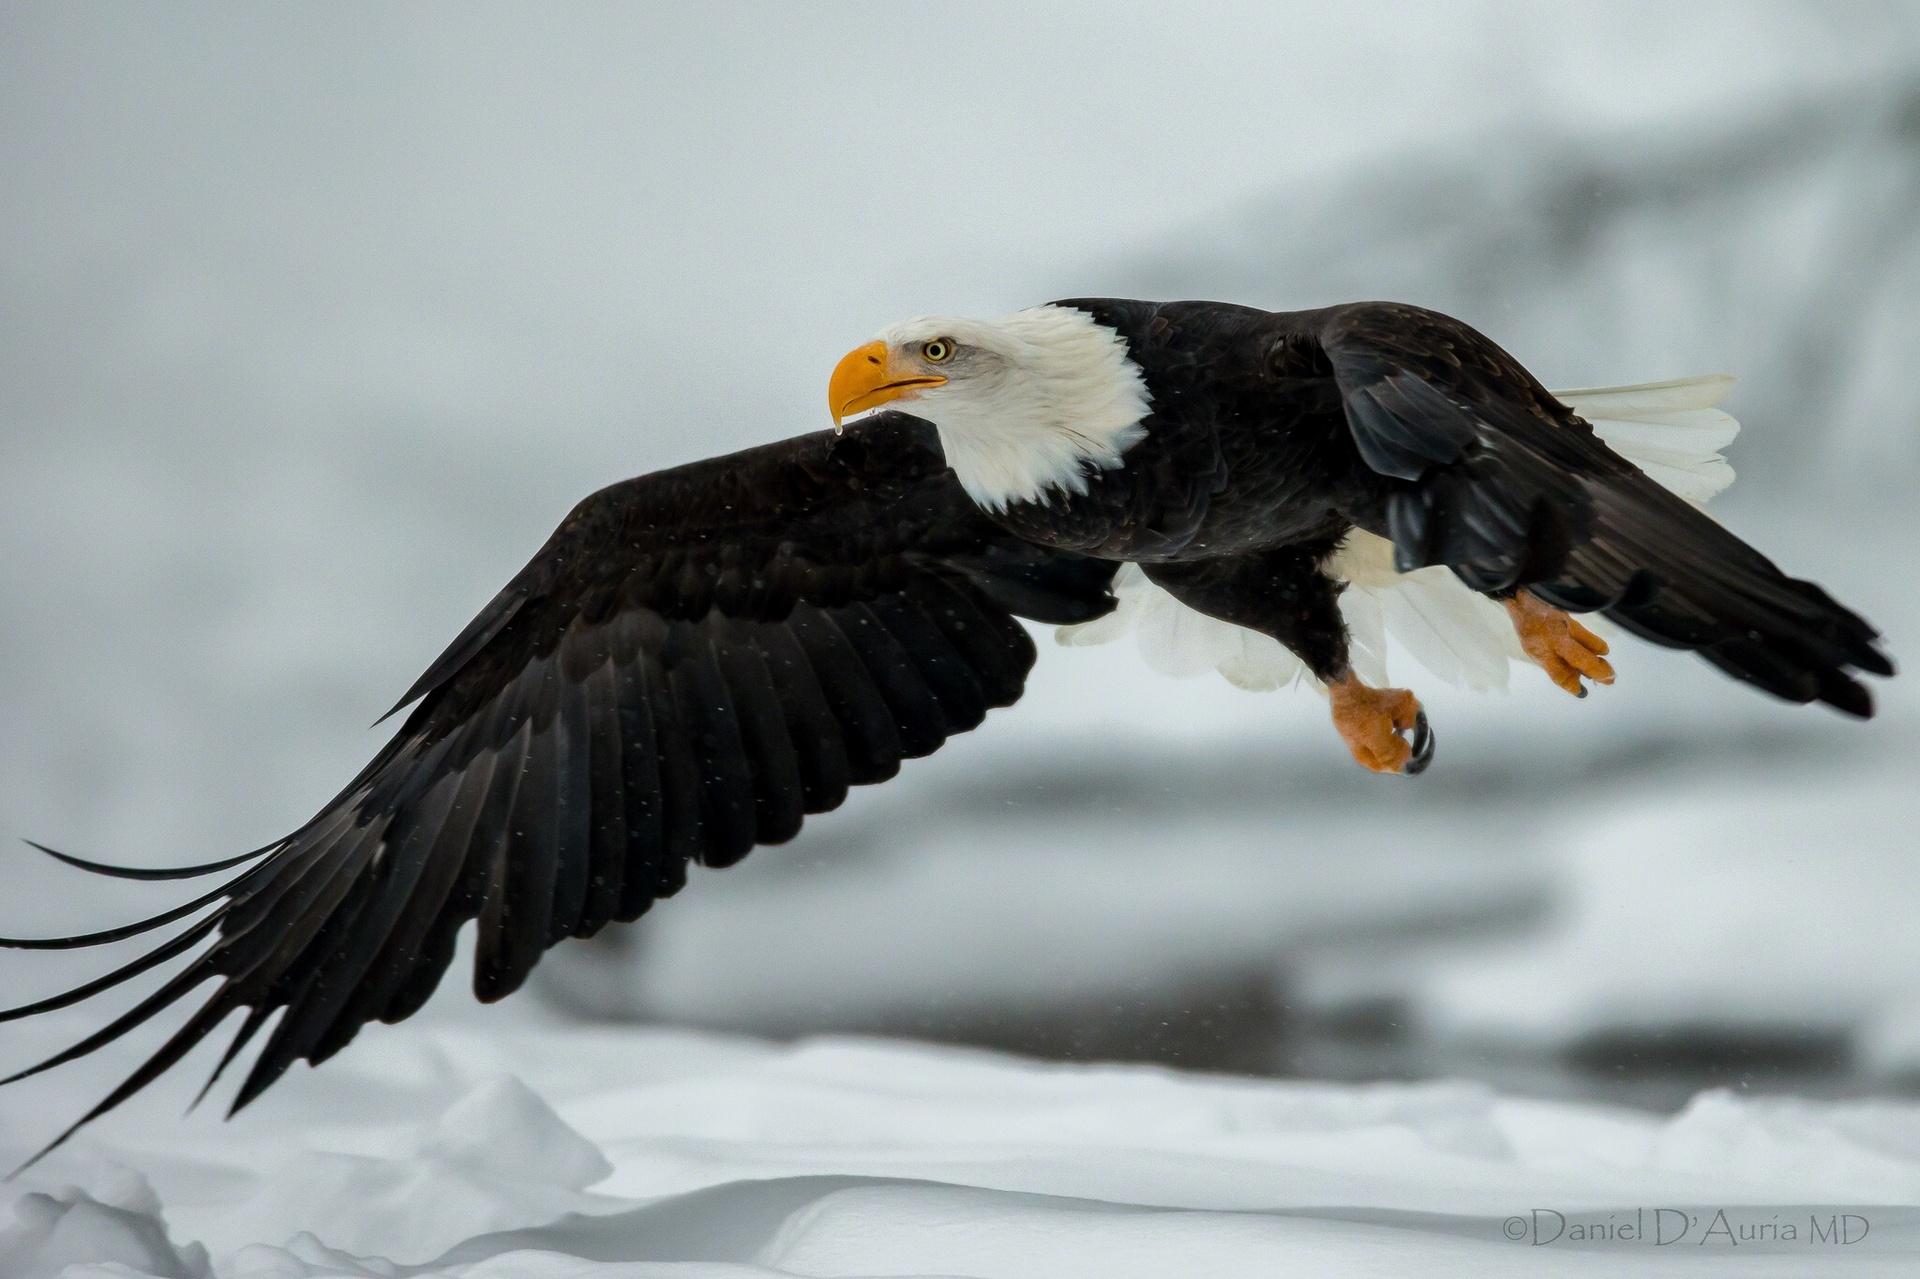 bald eagle wallpaper for ipad